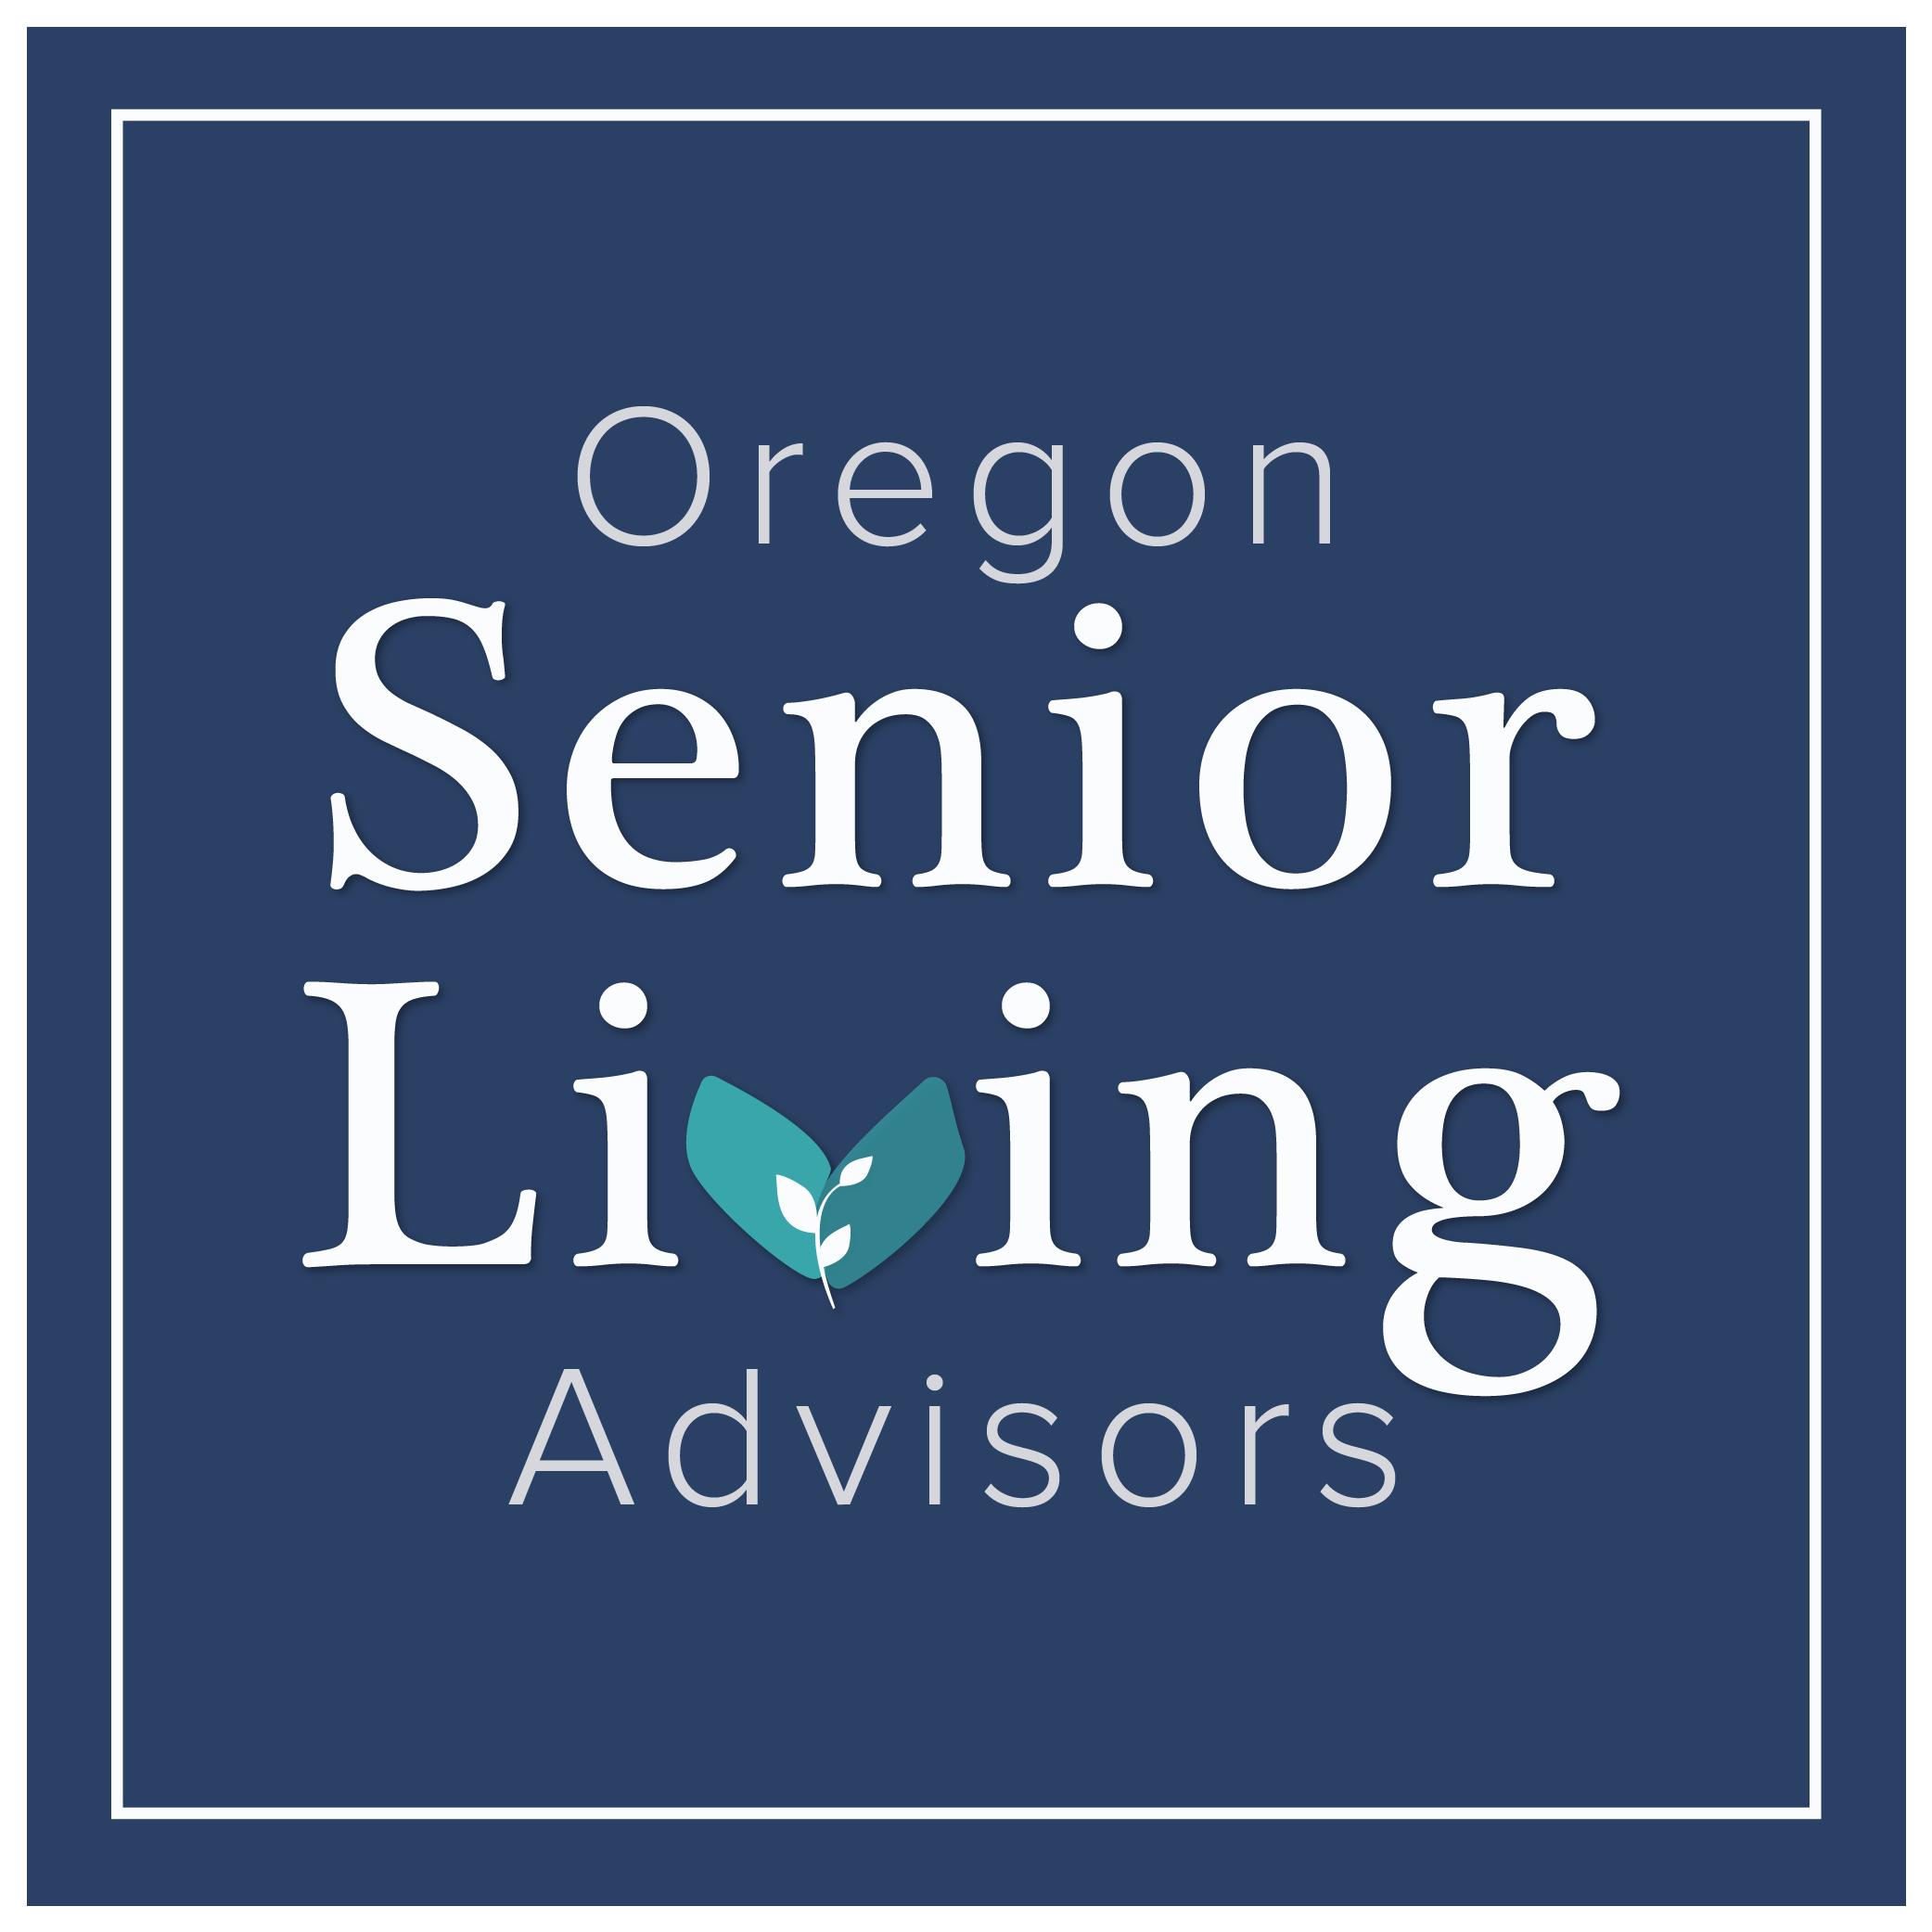 Oregon Senior Living Advisors, Main Logo Design by Brightly & Co.